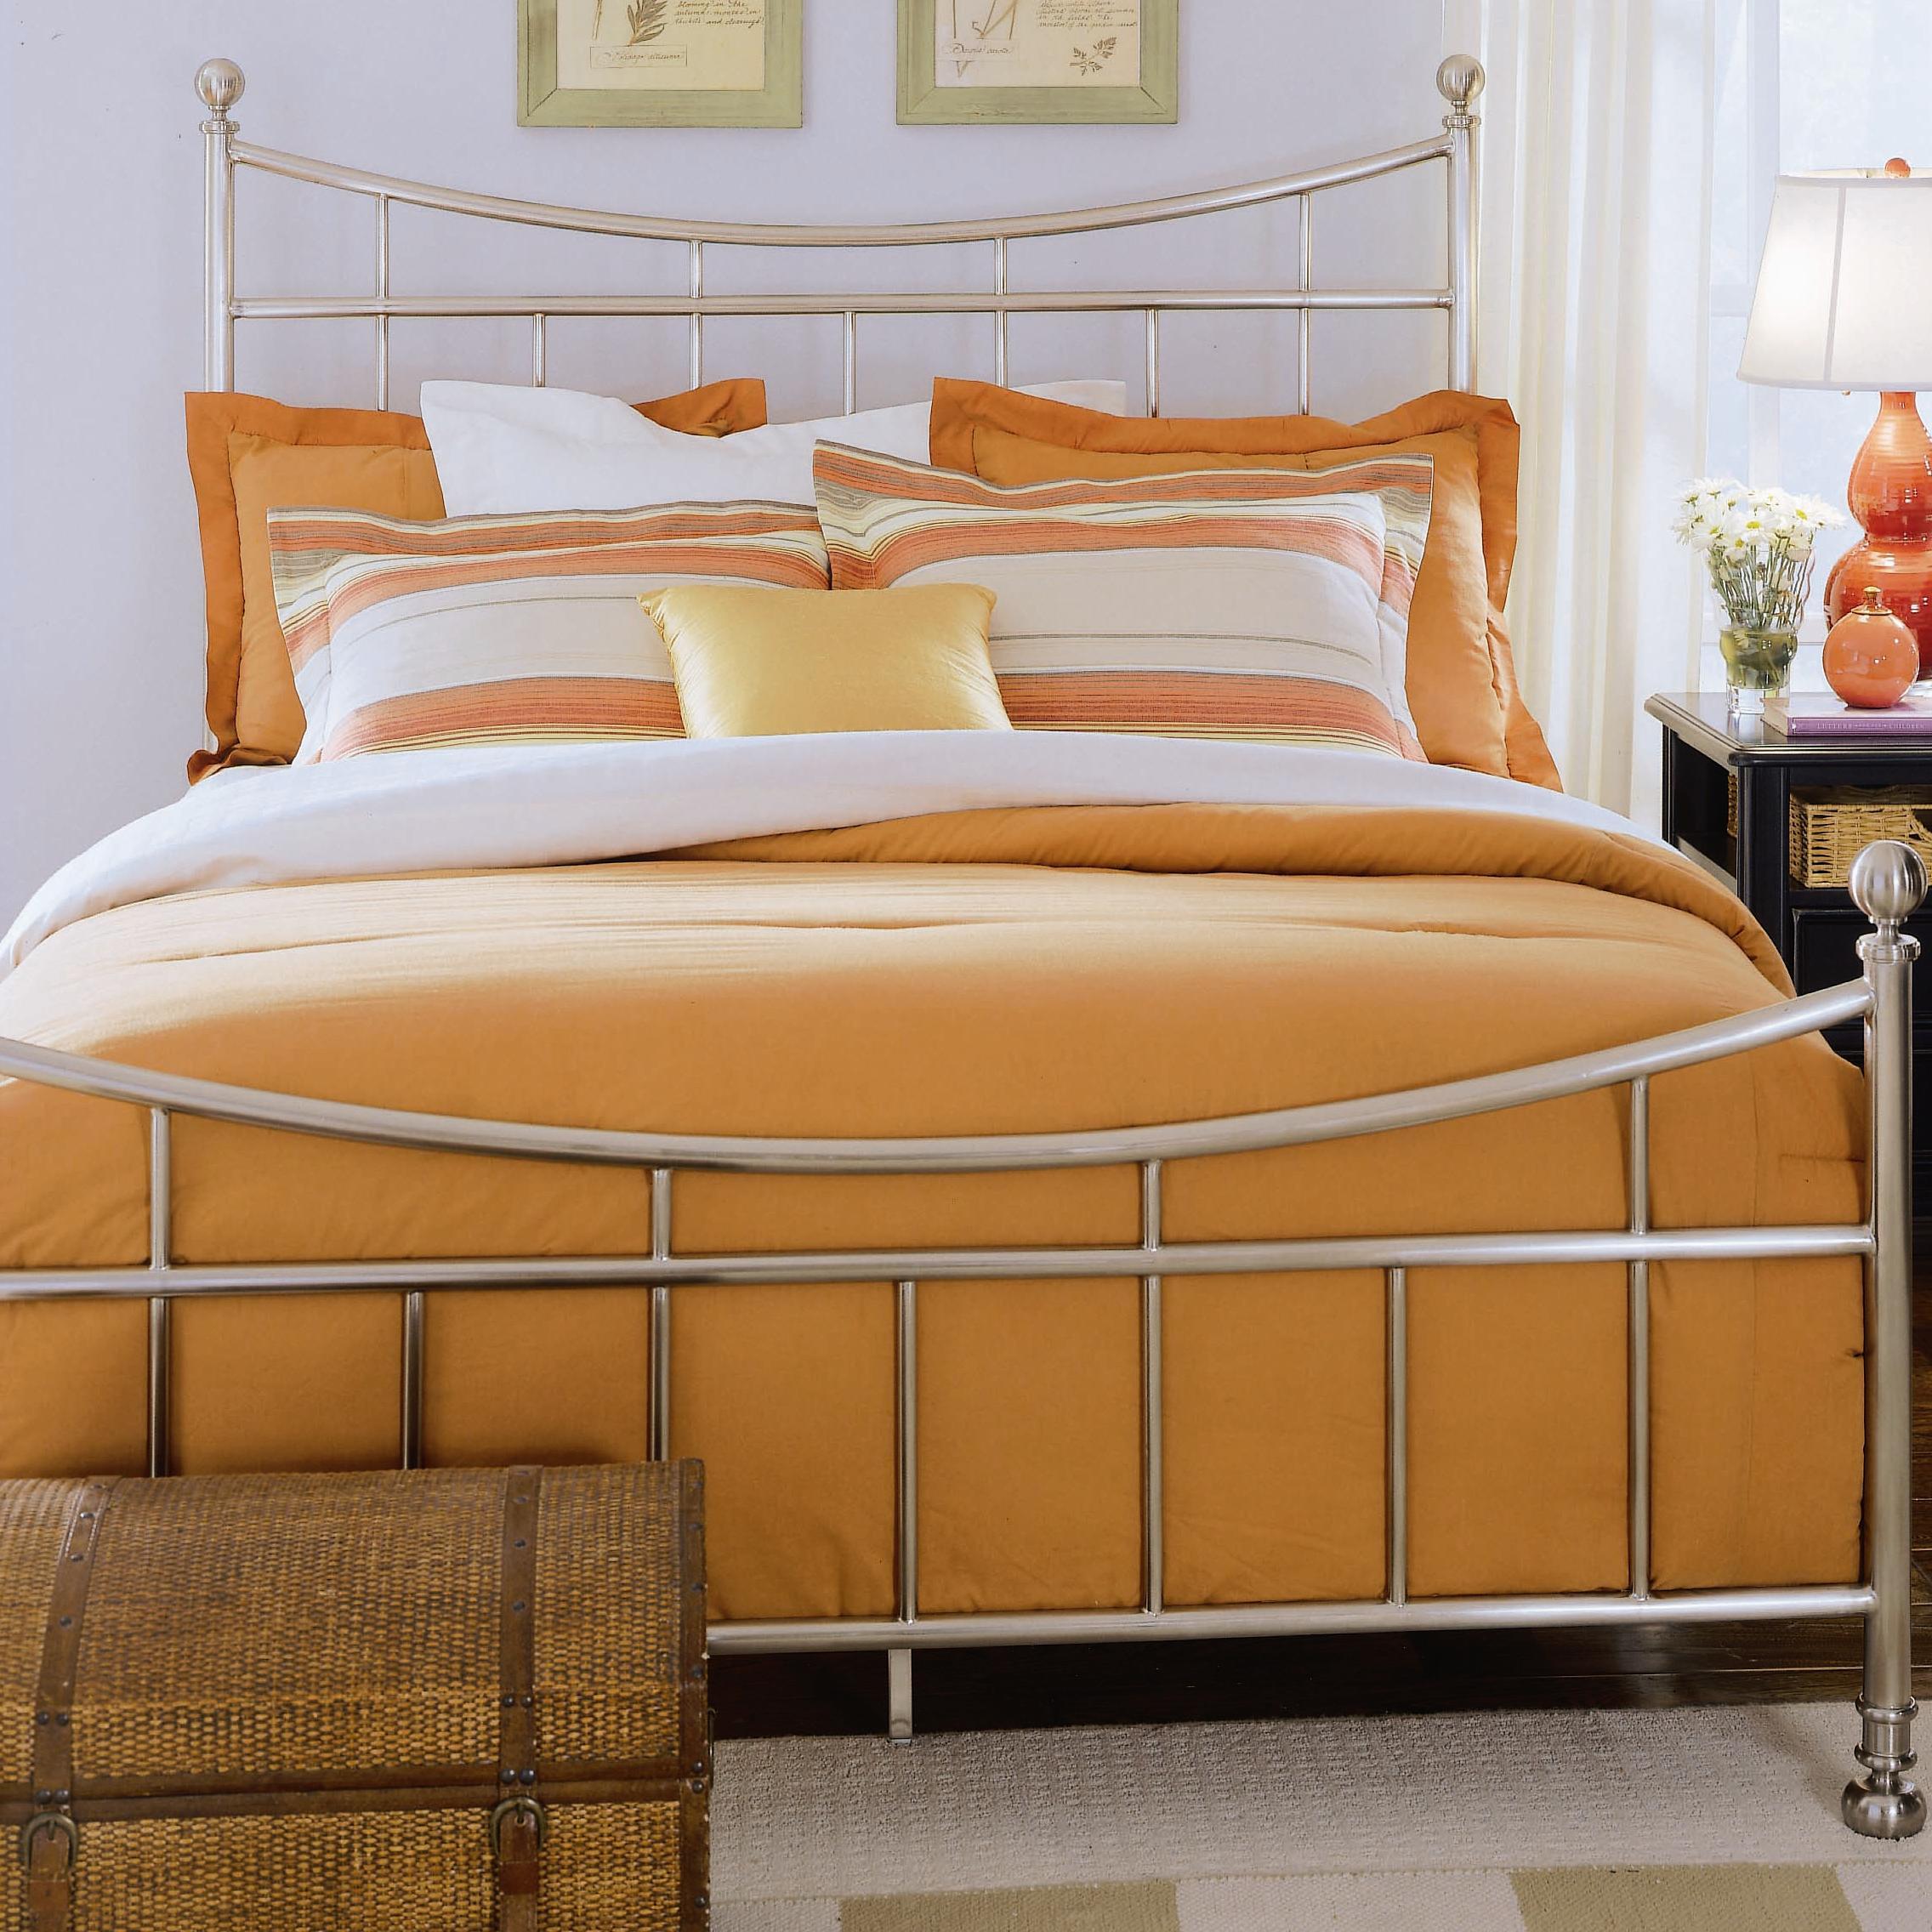 American Drew Camden - Dark Full Metal Bed  - Item Number: 919-393NR